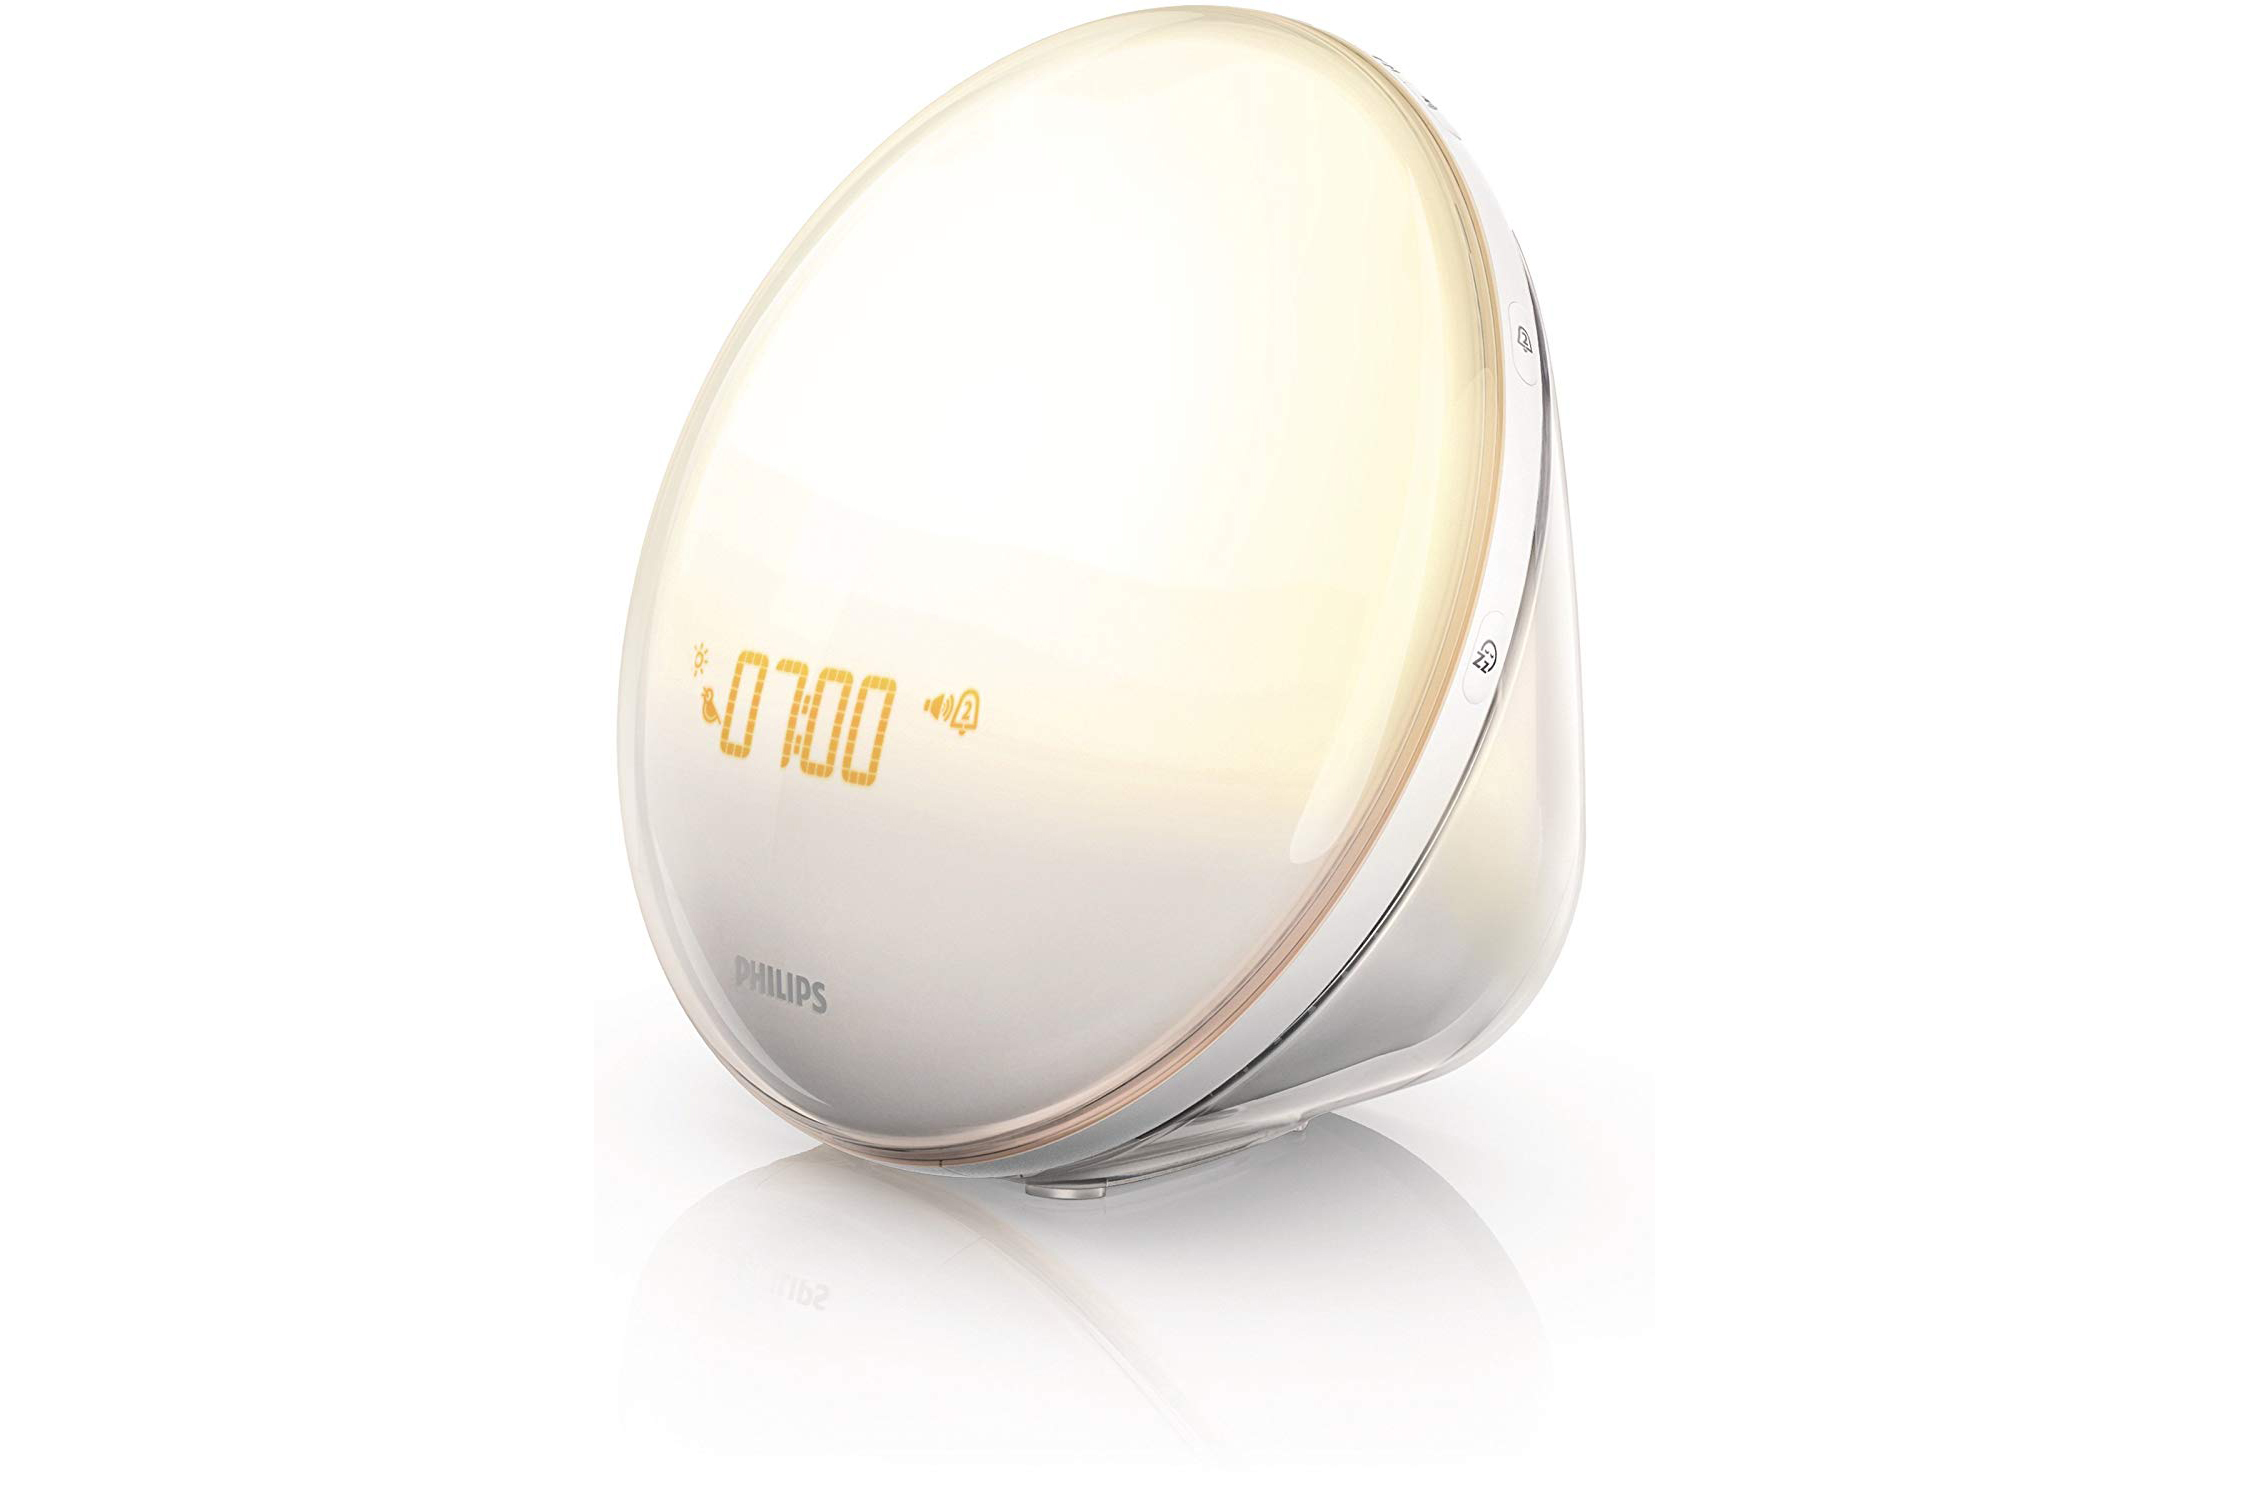 Philips Wake-Up Light HF3520 The Fully Optimized Day